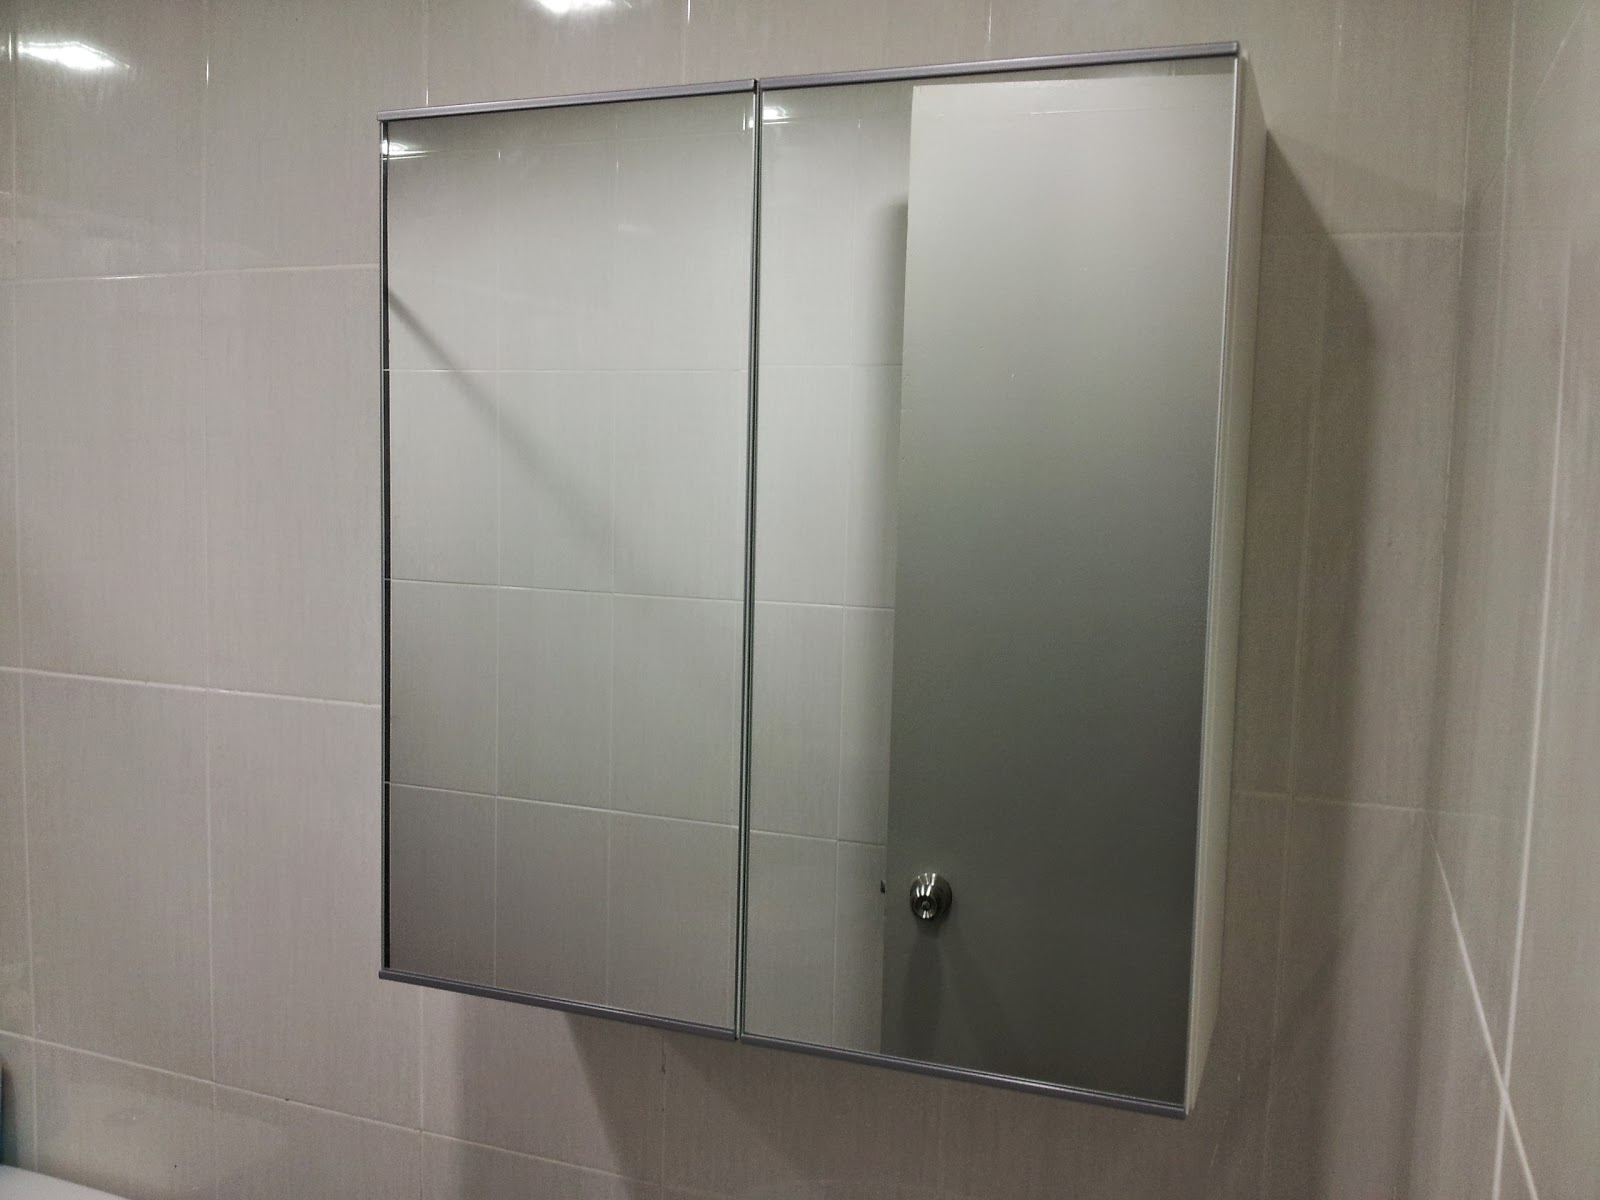 khyriel 39 s new lillangen mirror cabinet install. Black Bedroom Furniture Sets. Home Design Ideas